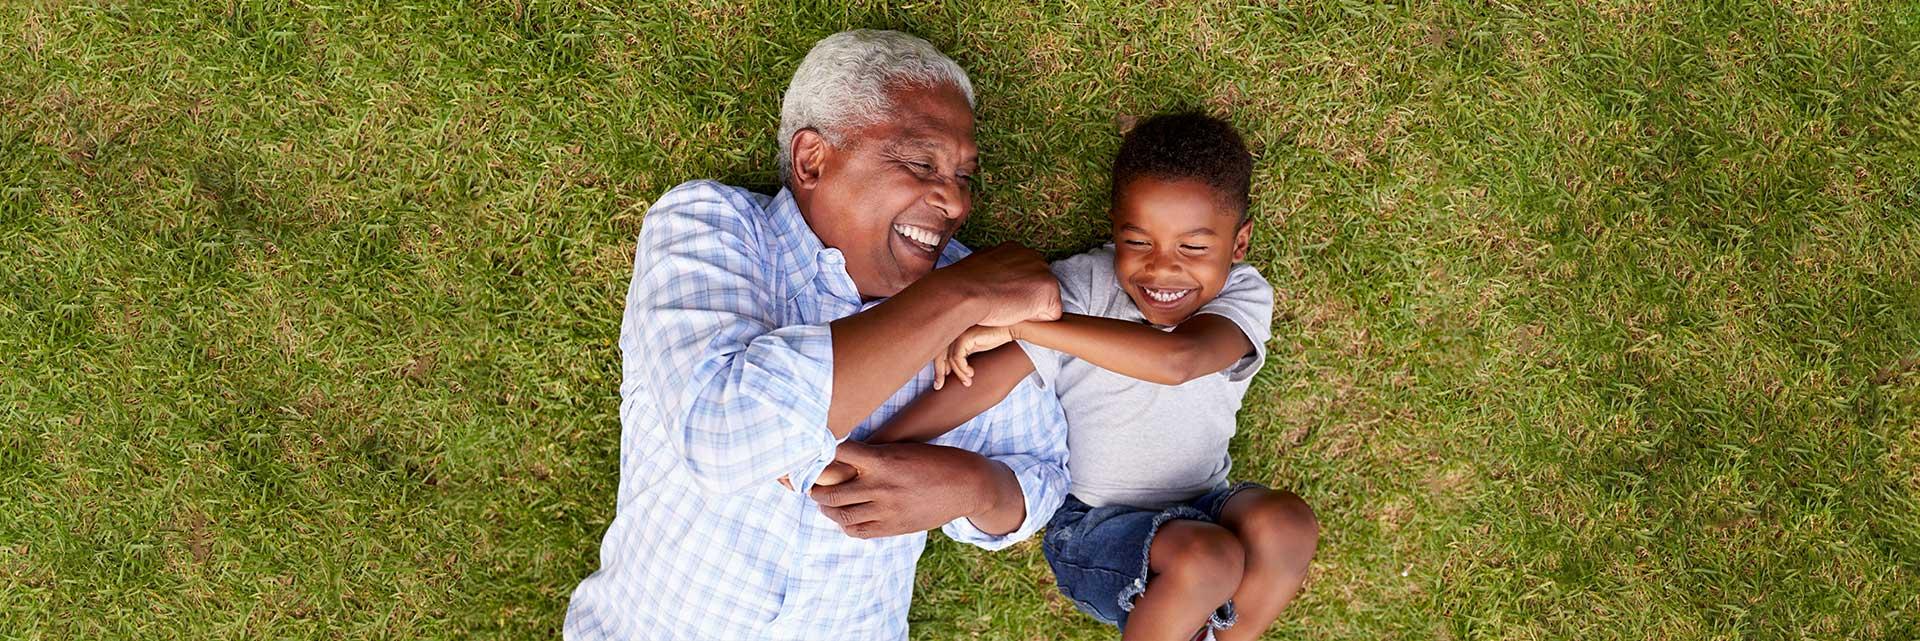 msp-developments-retirement-slider-retired-man-on-grass_1920x641